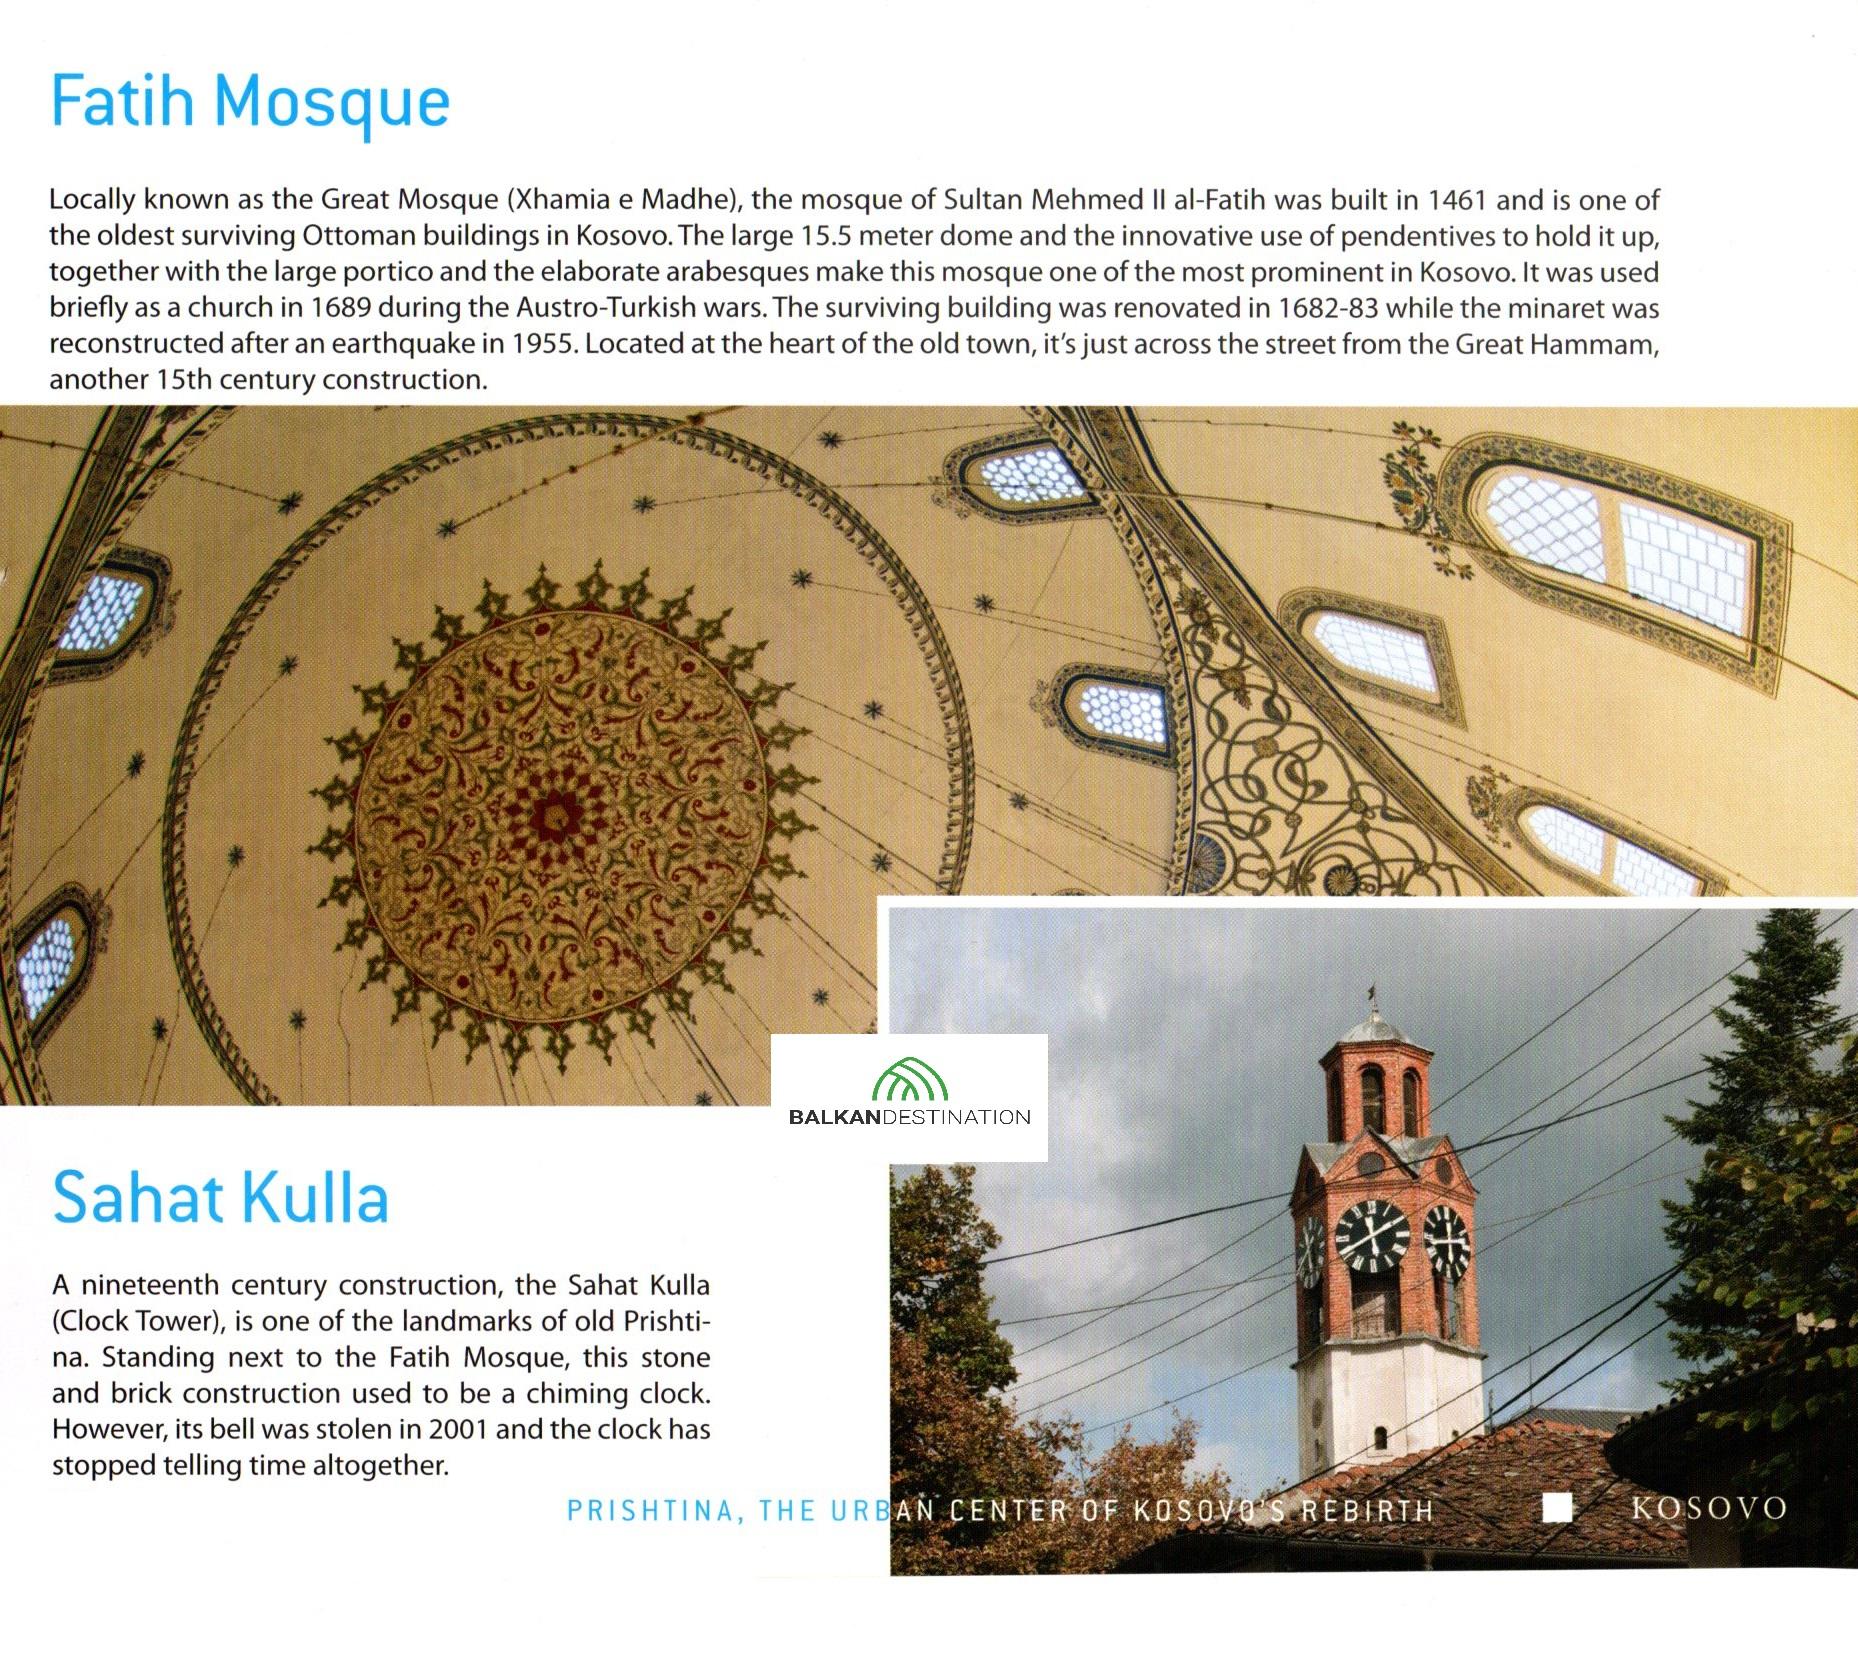 balkandestination fatih mosque clocktower pristina kosovo